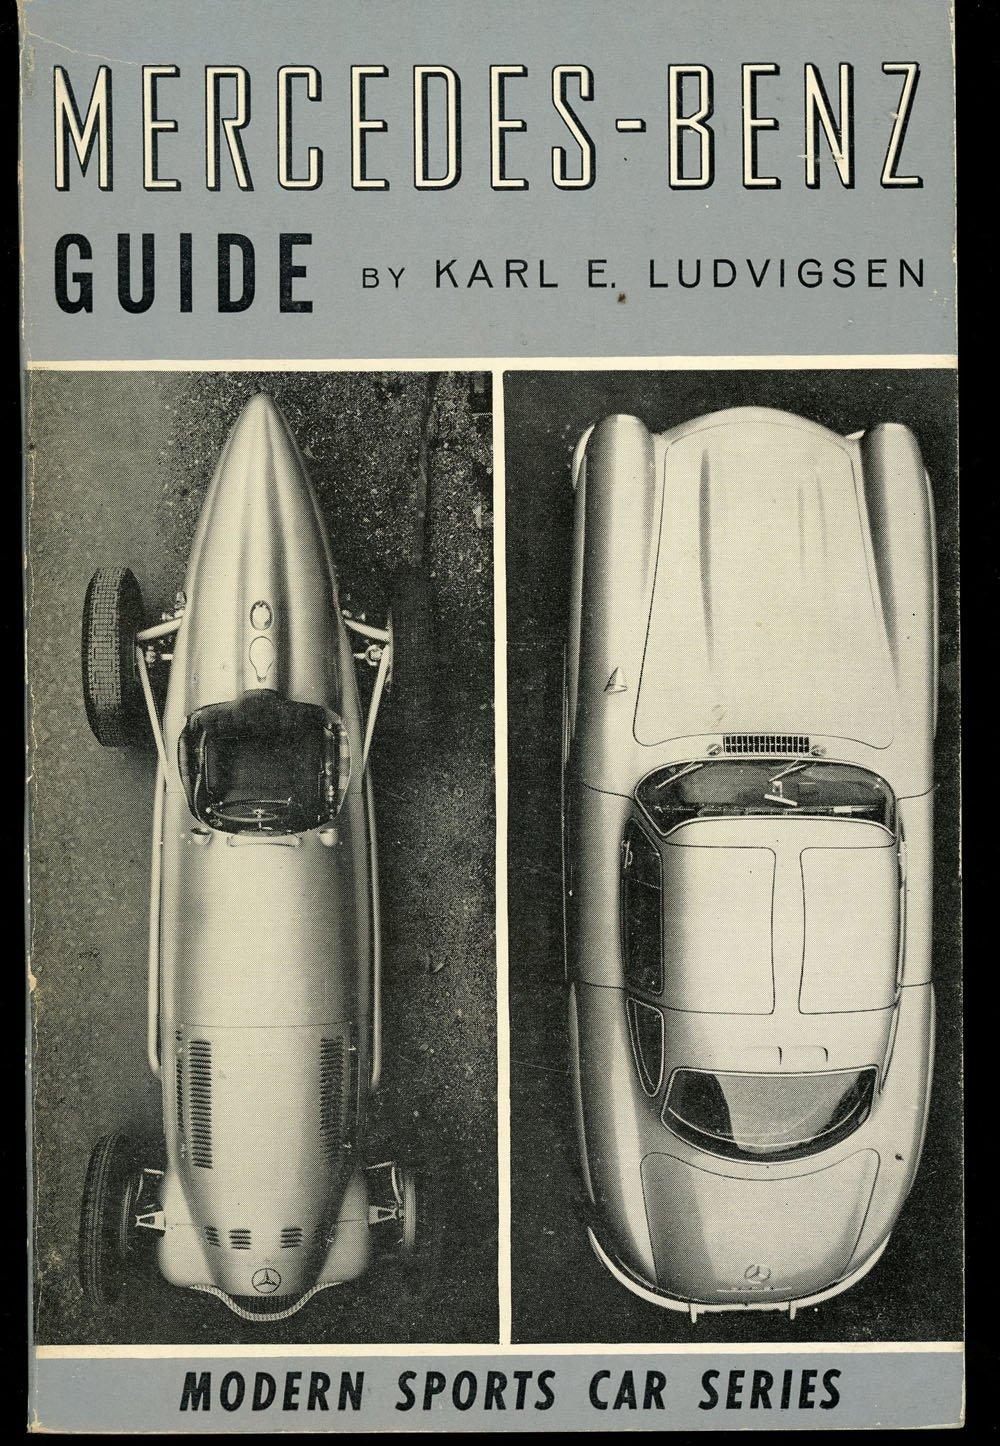 Mercedes-Benz Guide